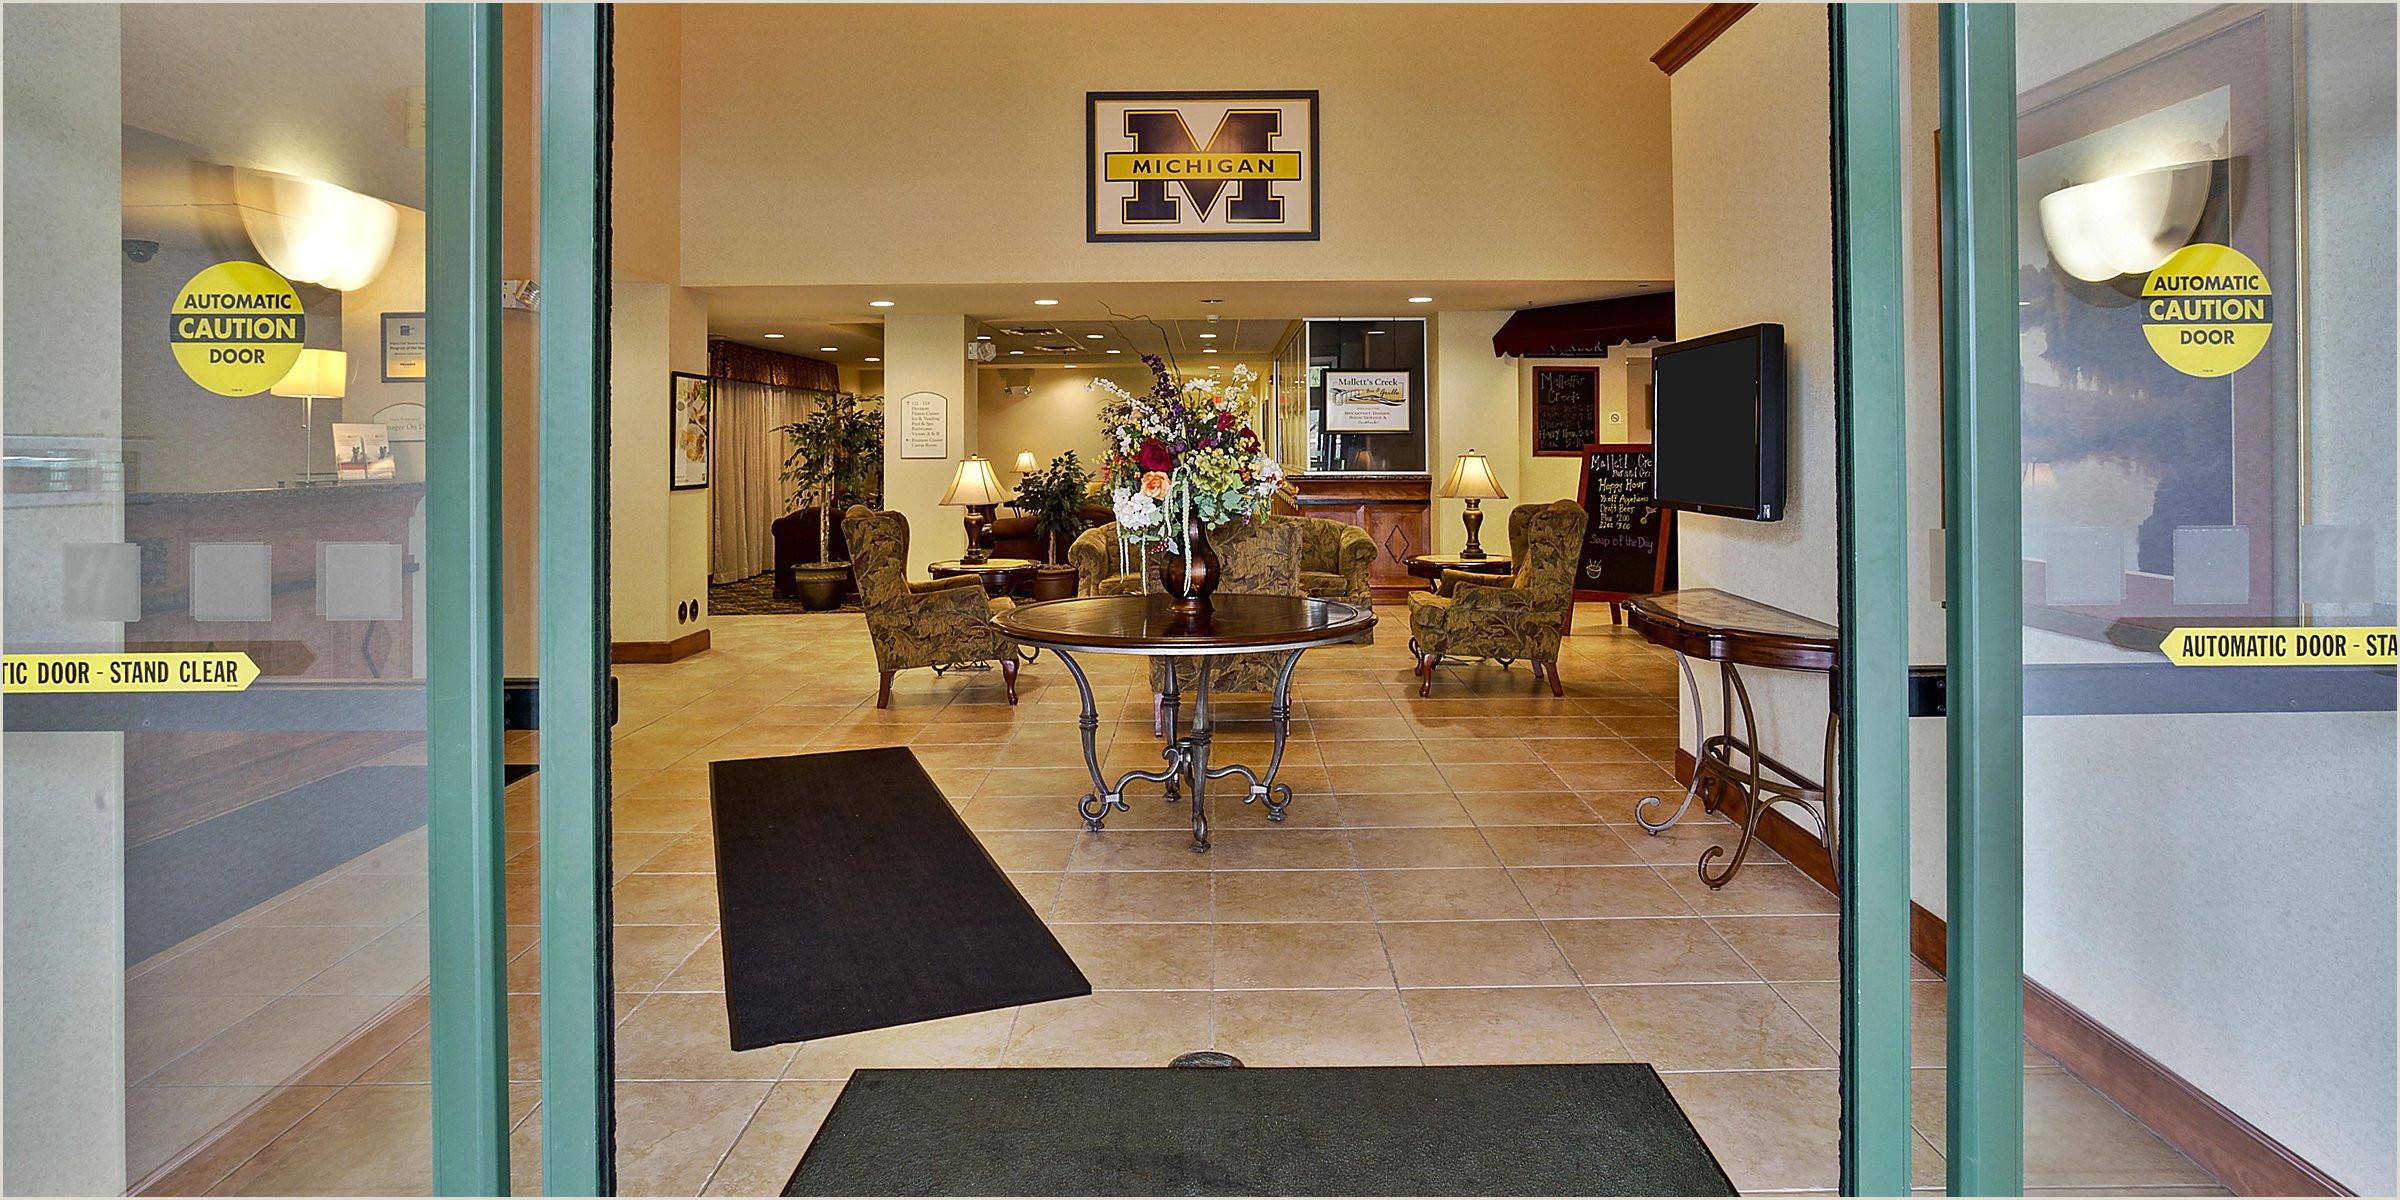 Michigan Driving Log Book Holiday Inn Hotel & Suites Ann Arbor Univ Michigan area